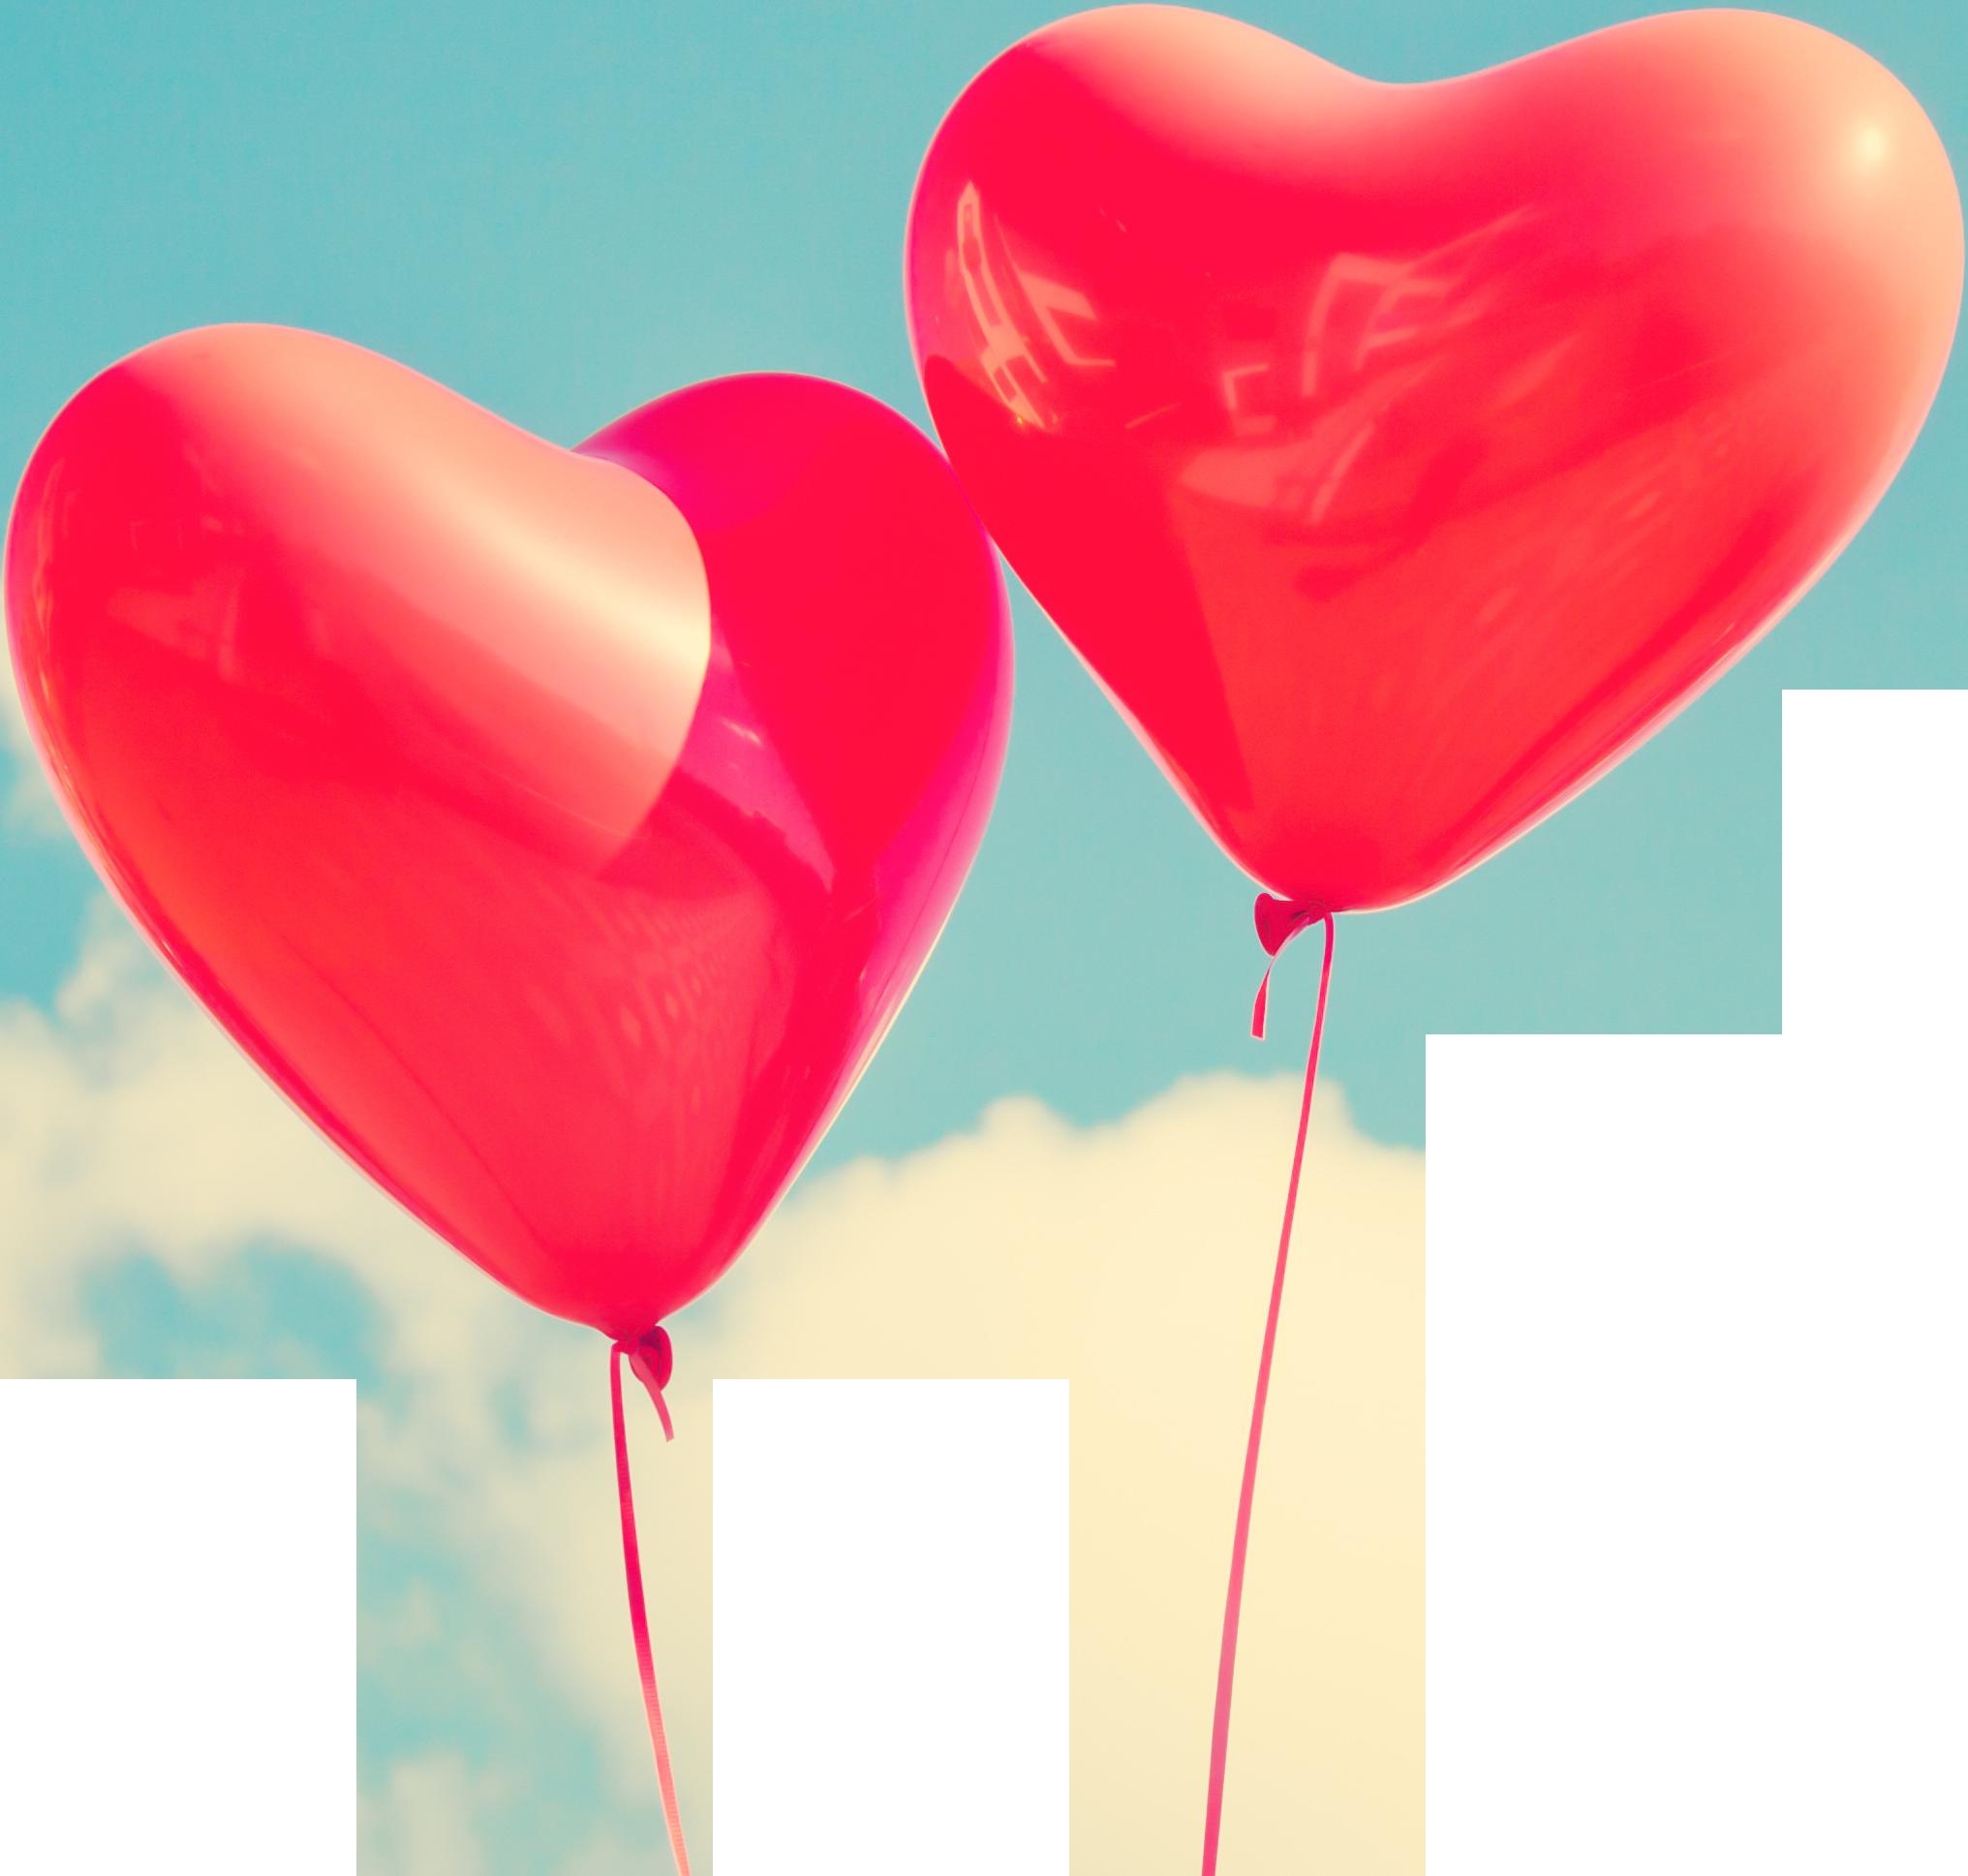 Download Valentines Day Image HQ PNG Image | FreePNGImg